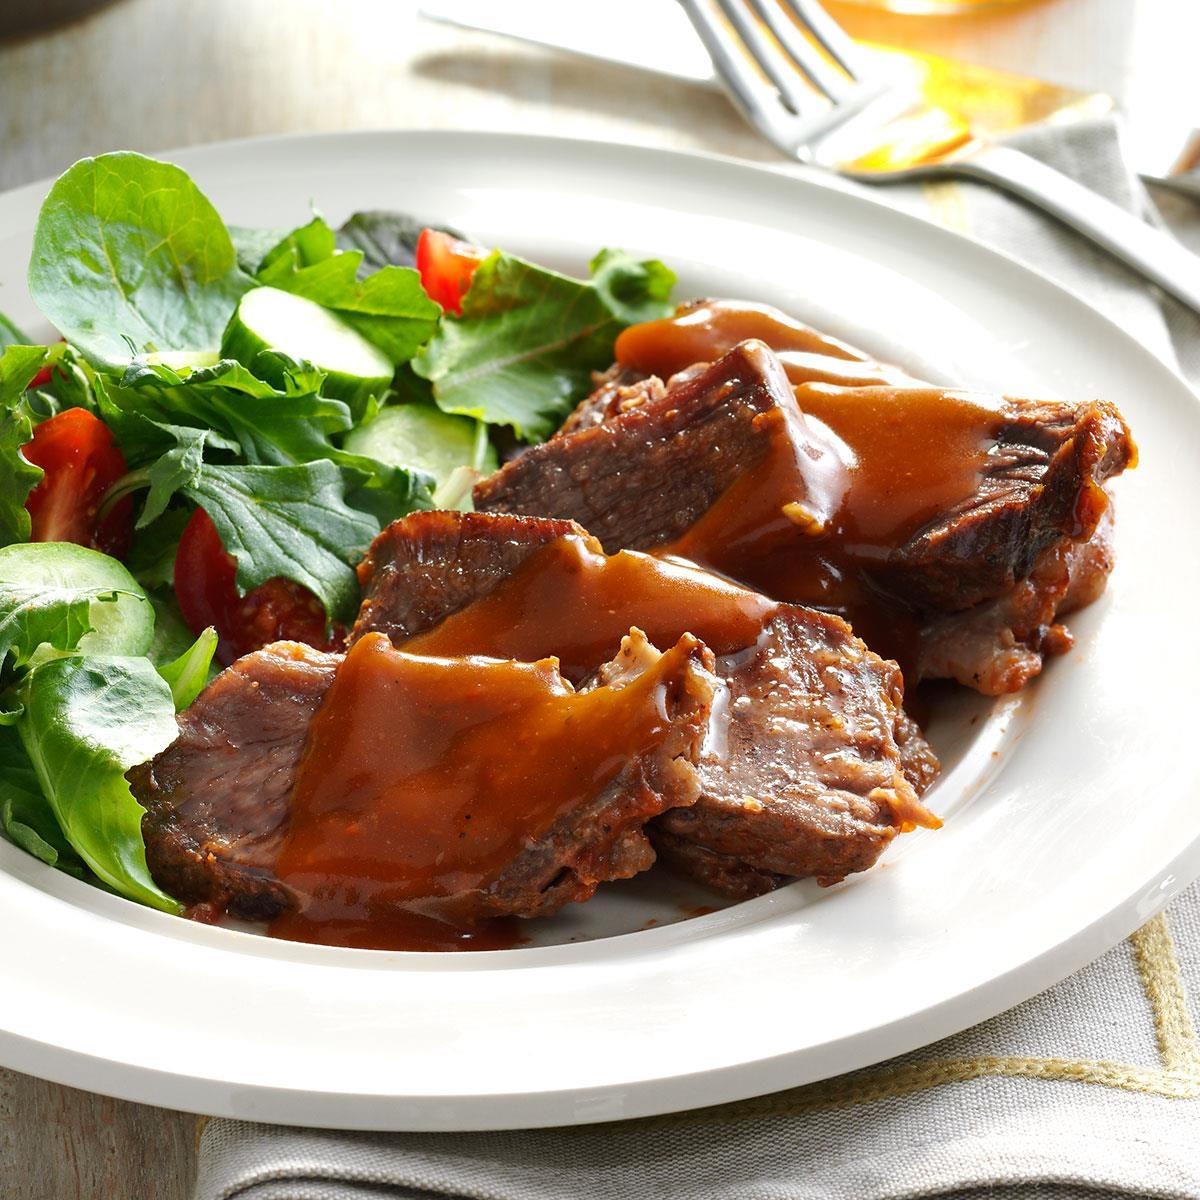 65: Sweet 'n' Tangy Pot Roast